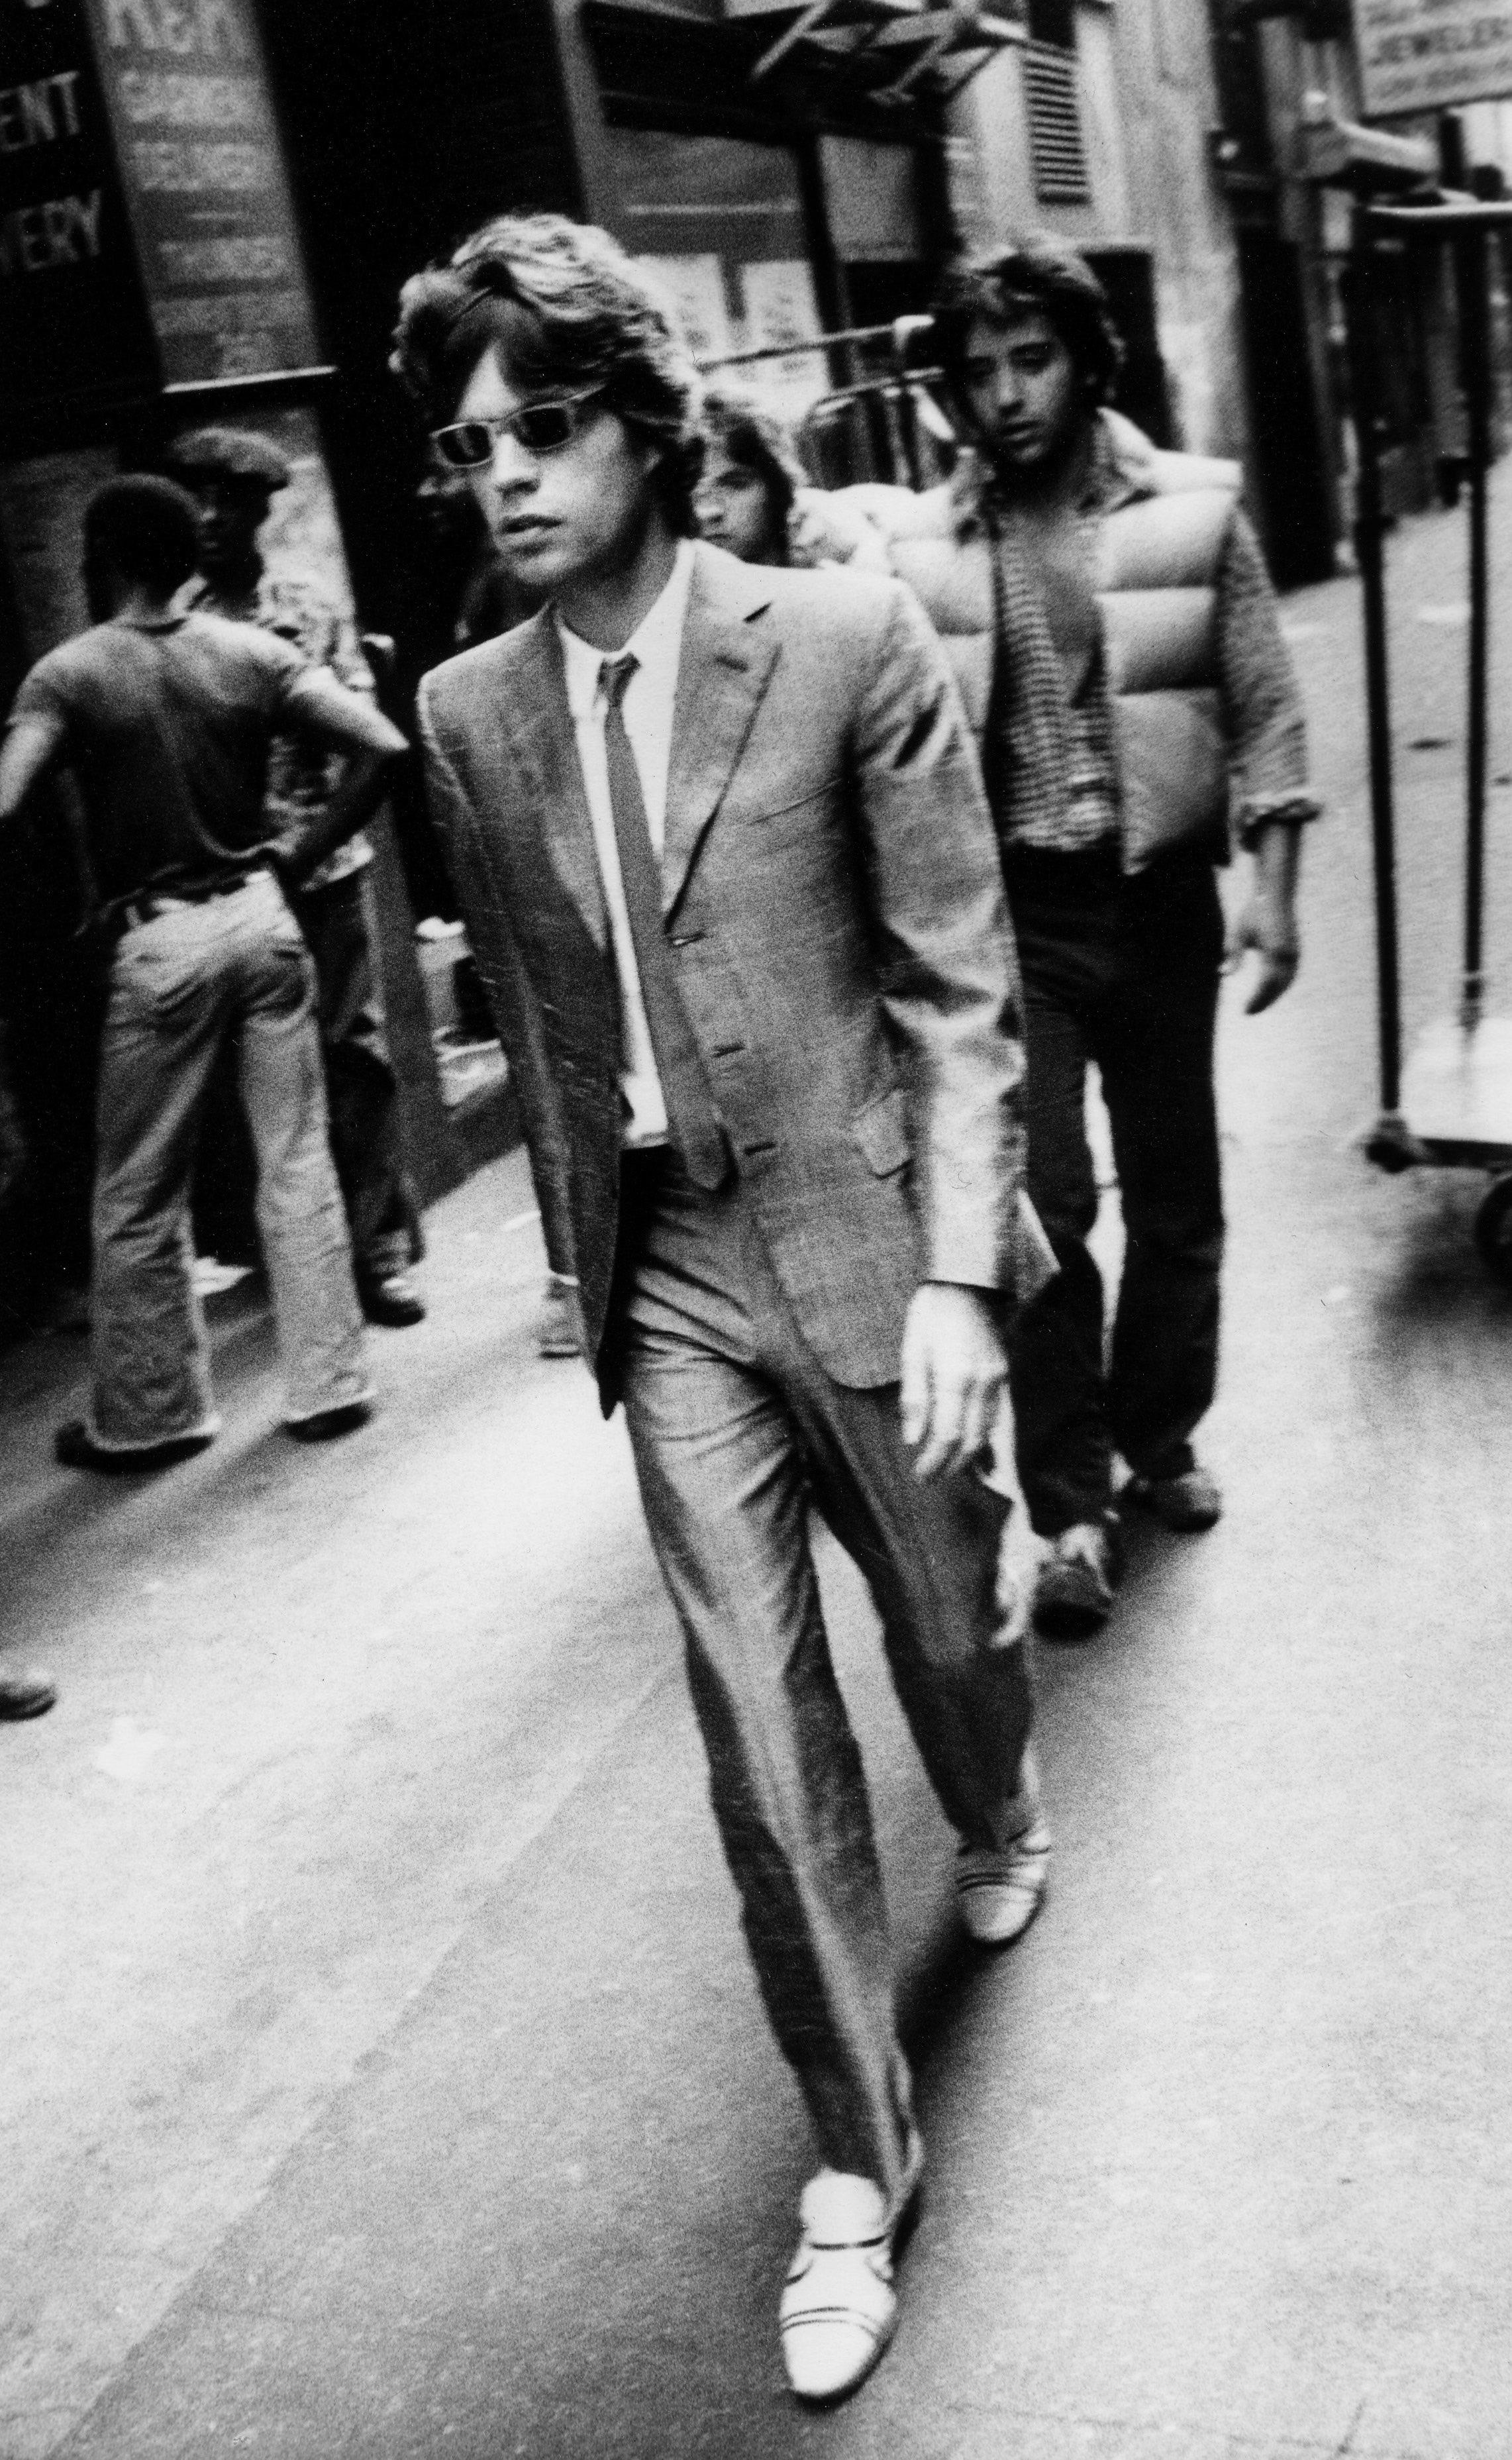 Mick Jagger, New York City, 1980